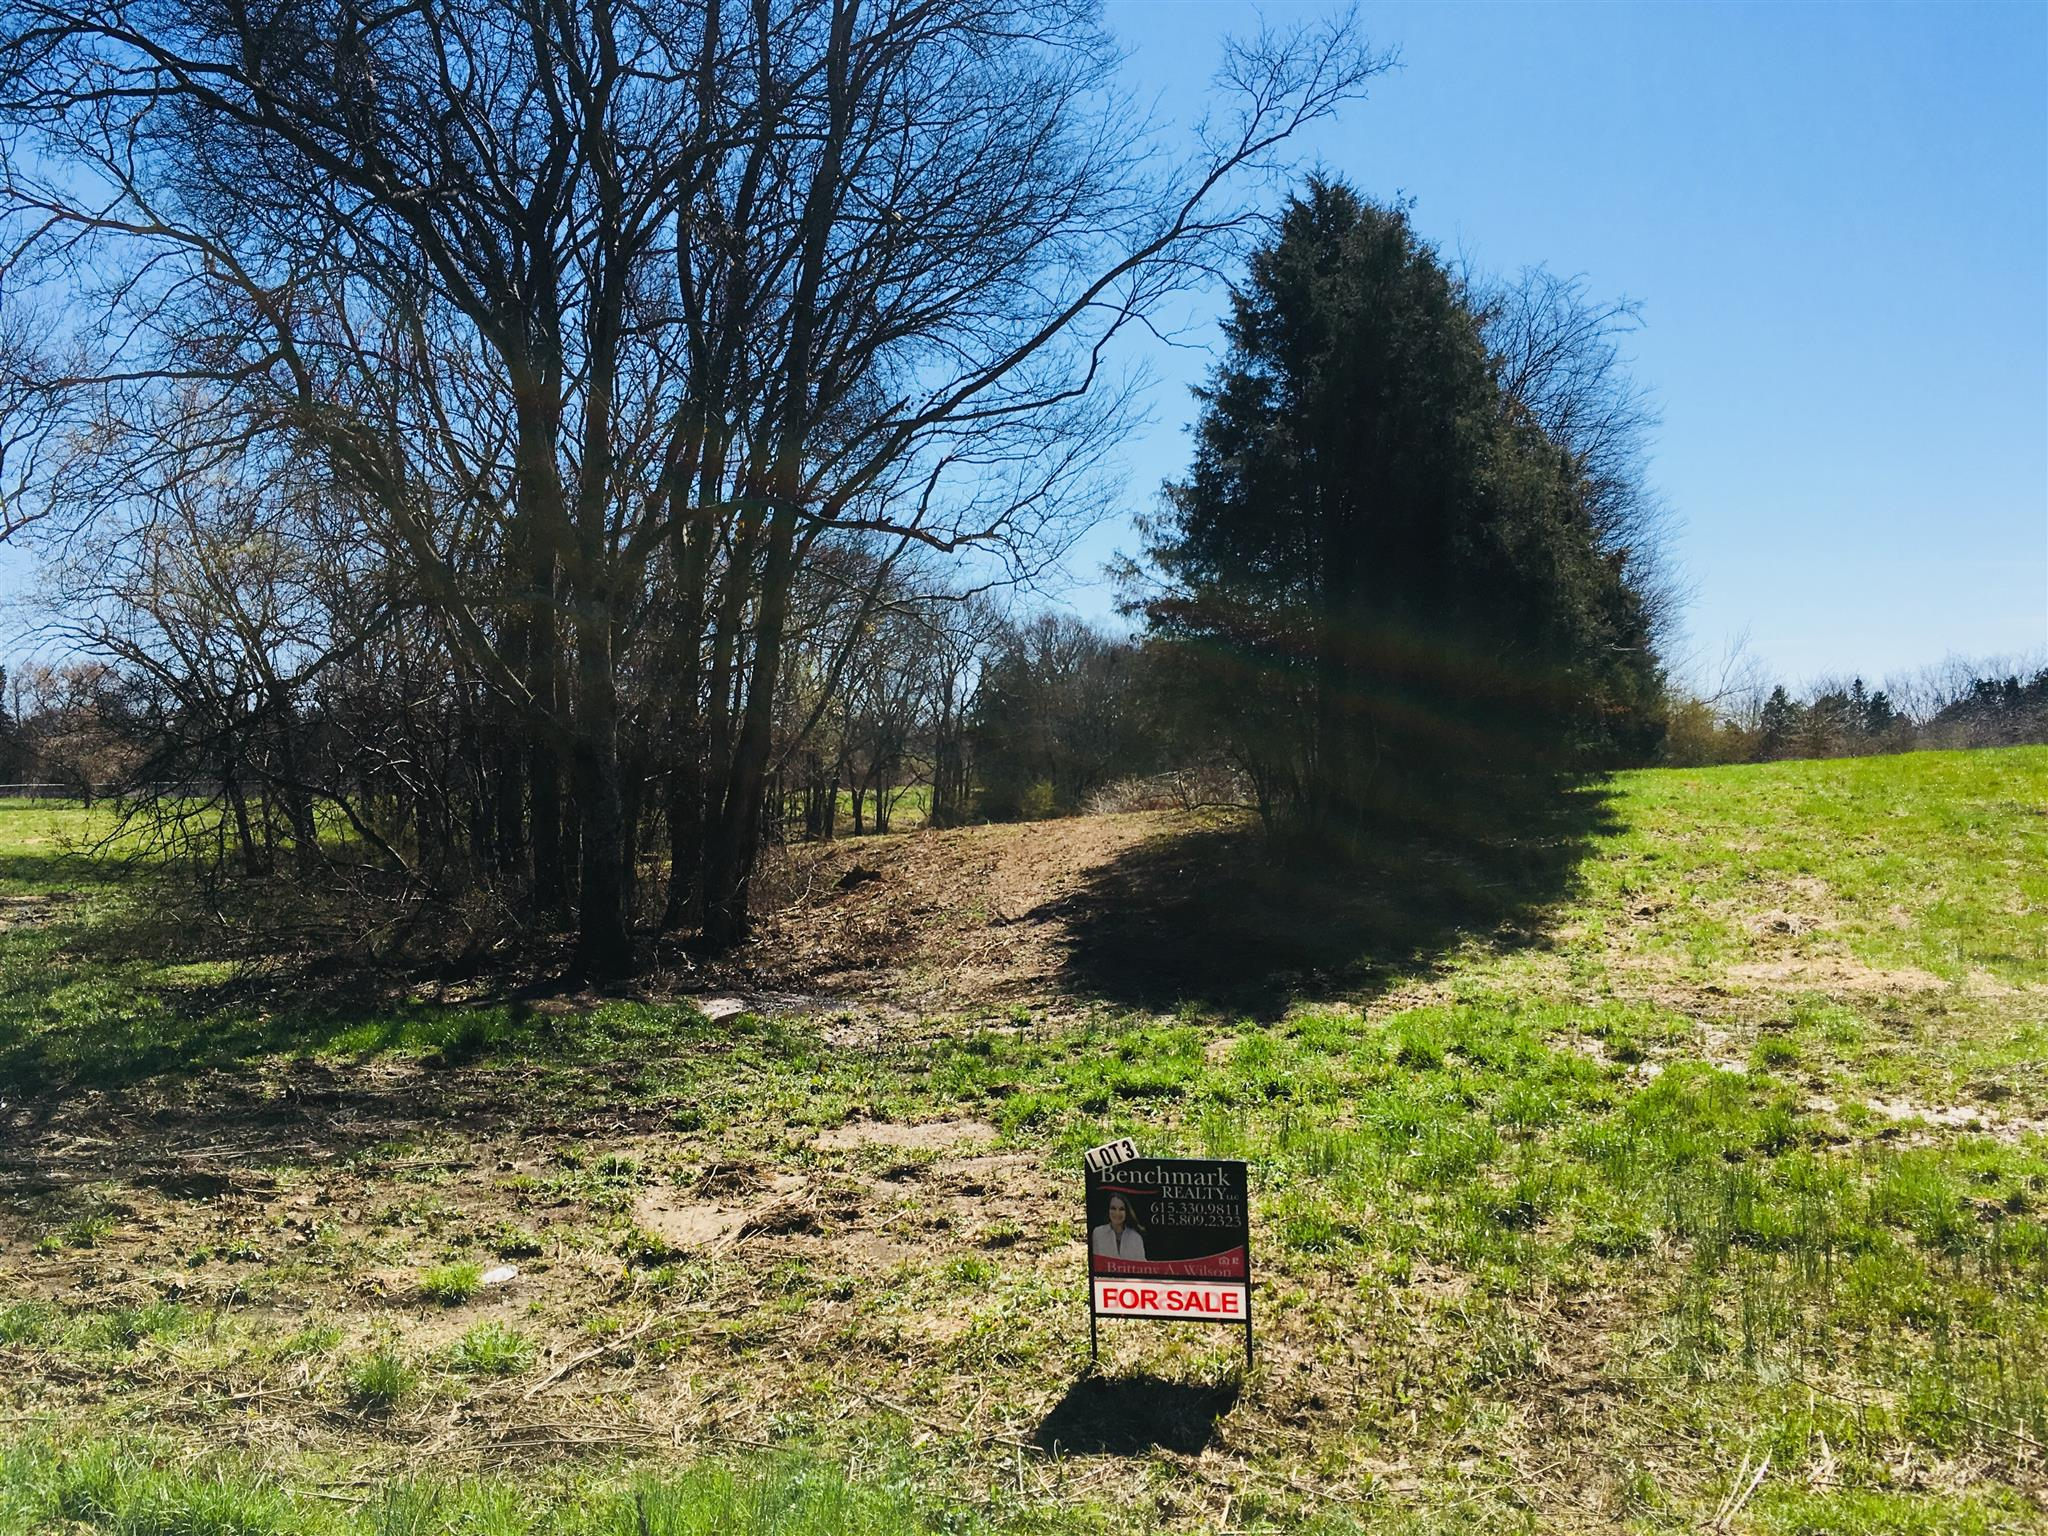 359 Eady Rd, Shelbyville, TN 37160 - Shelbyville, TN real estate listing